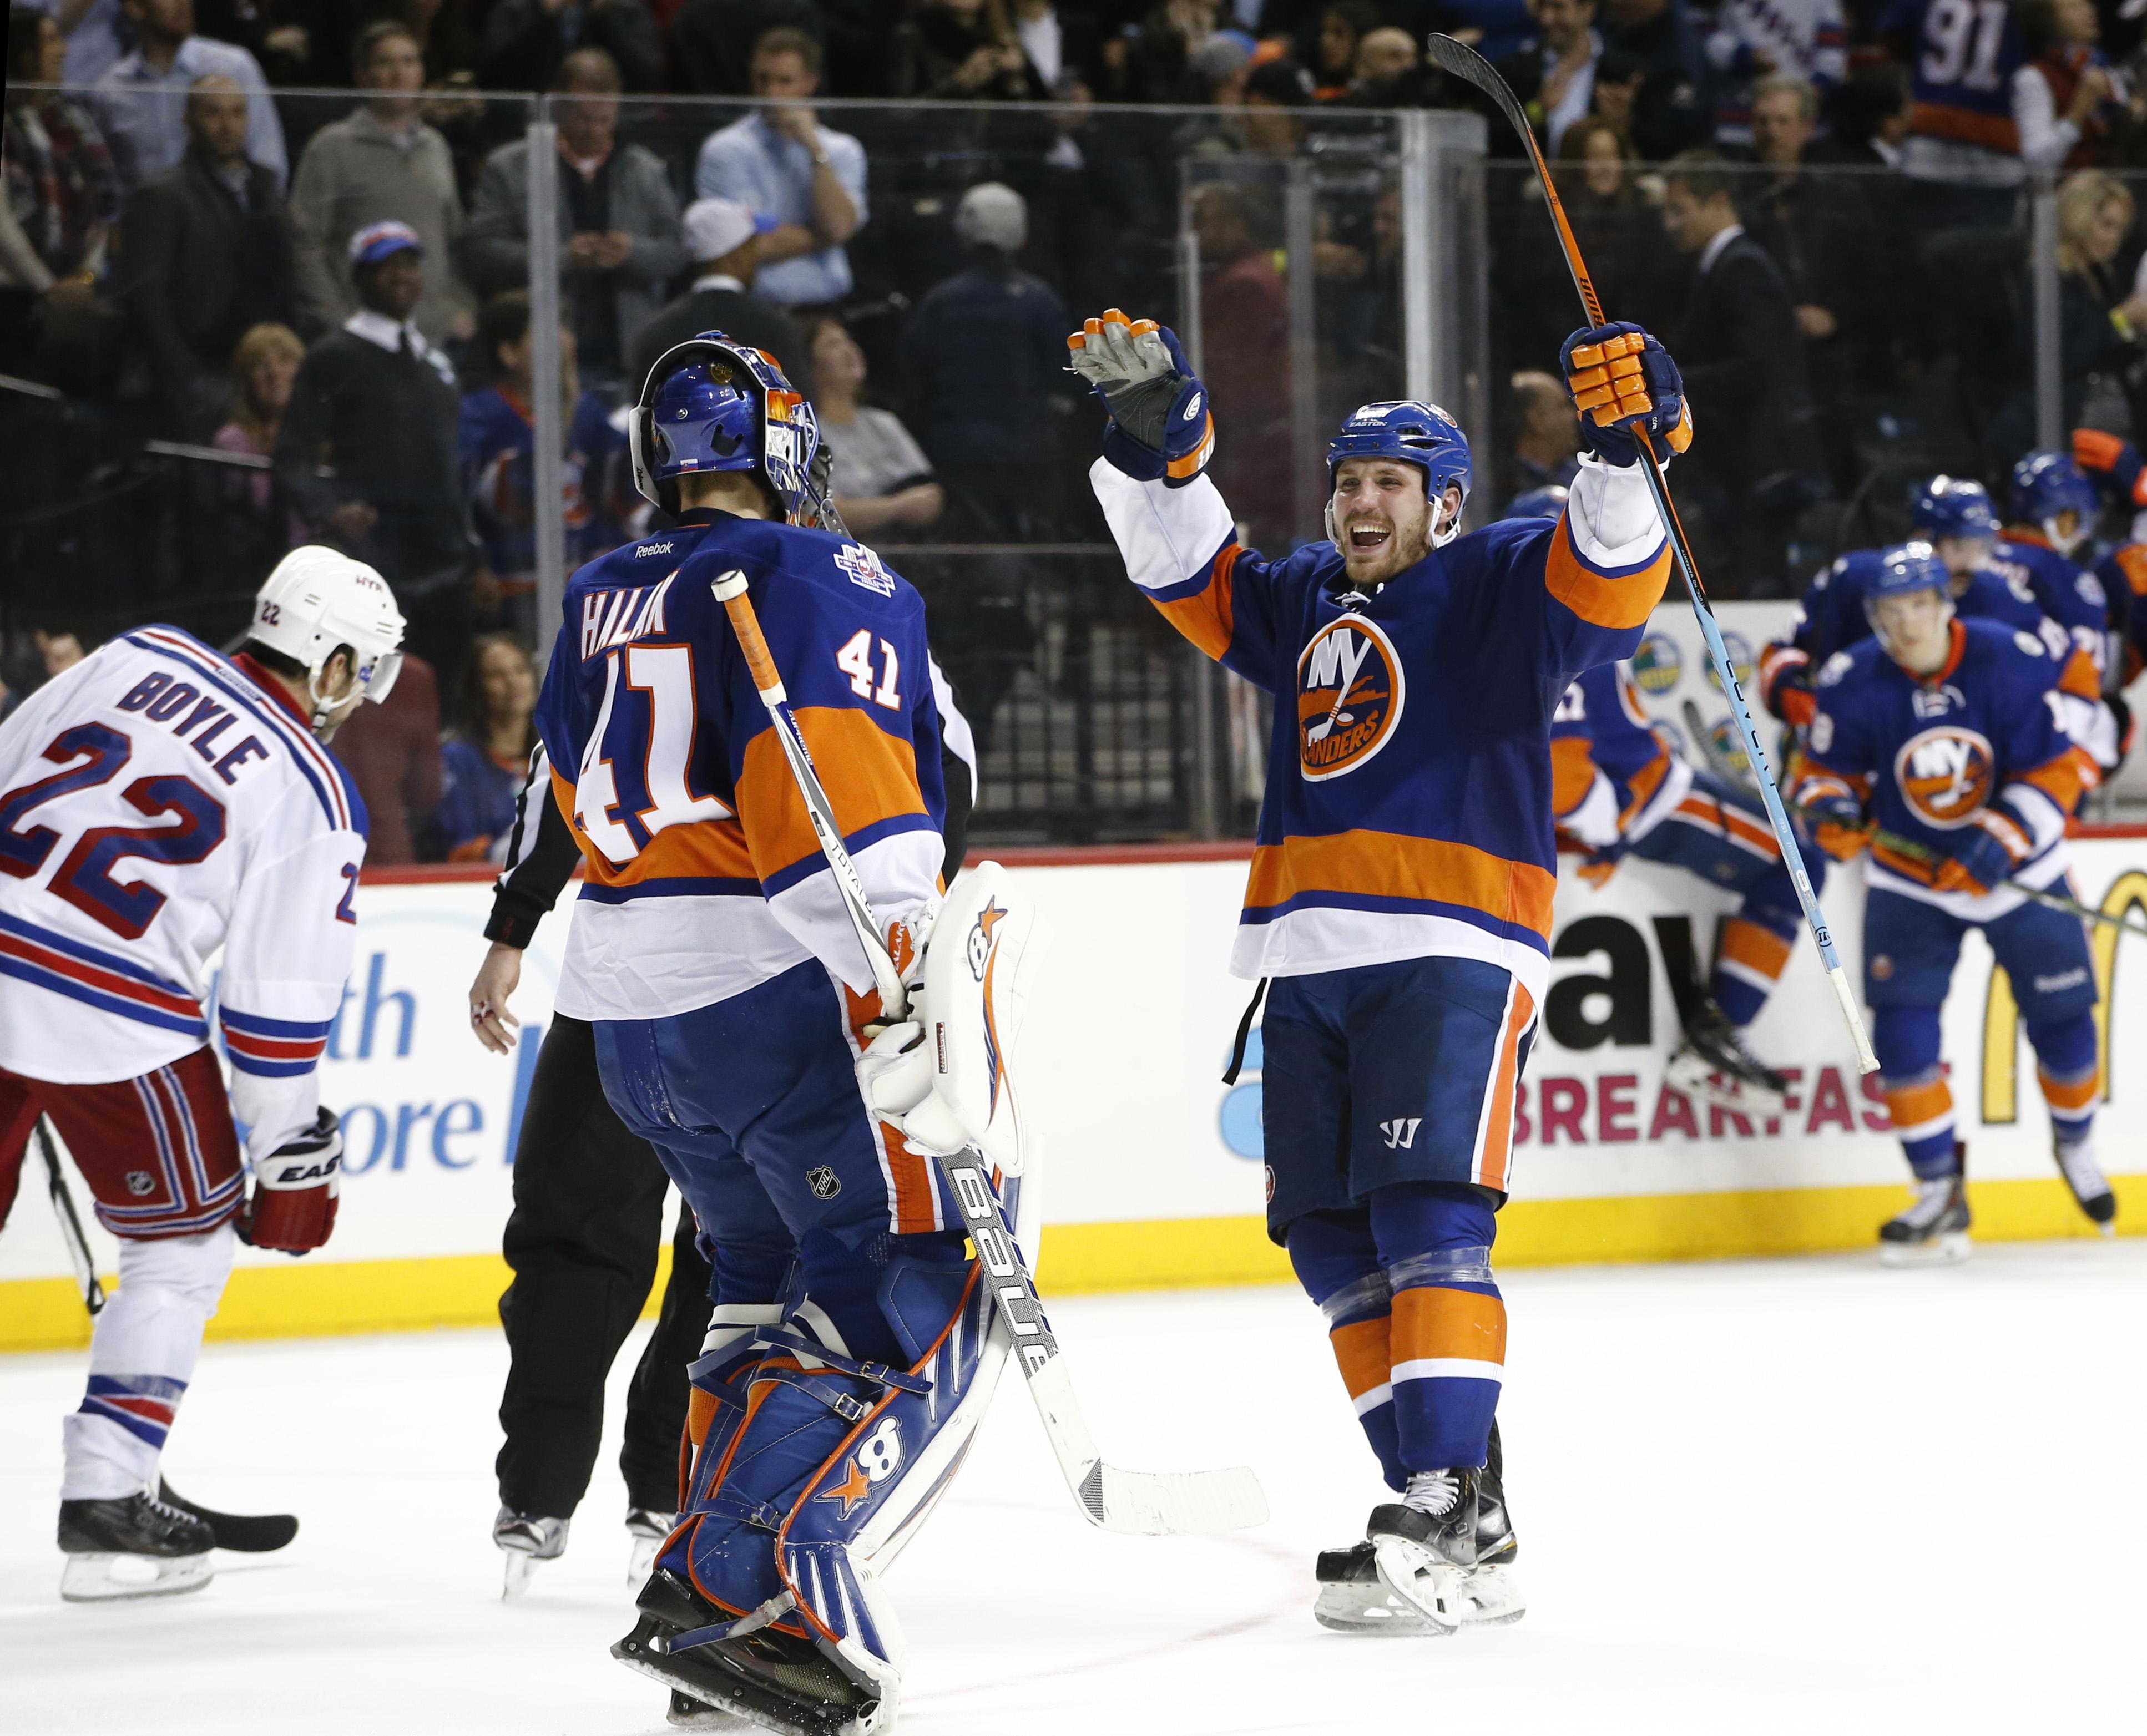 New York Rangers defenseman Dan Boyle (22) skates away as New York Islanders center Casey Cizikas (53) reacts after the Islanders defeated the New York Rangers 2-1 in a shootout in an NHL hockey game at the Barclays Center in New York, Wednesday, Dec. 2,